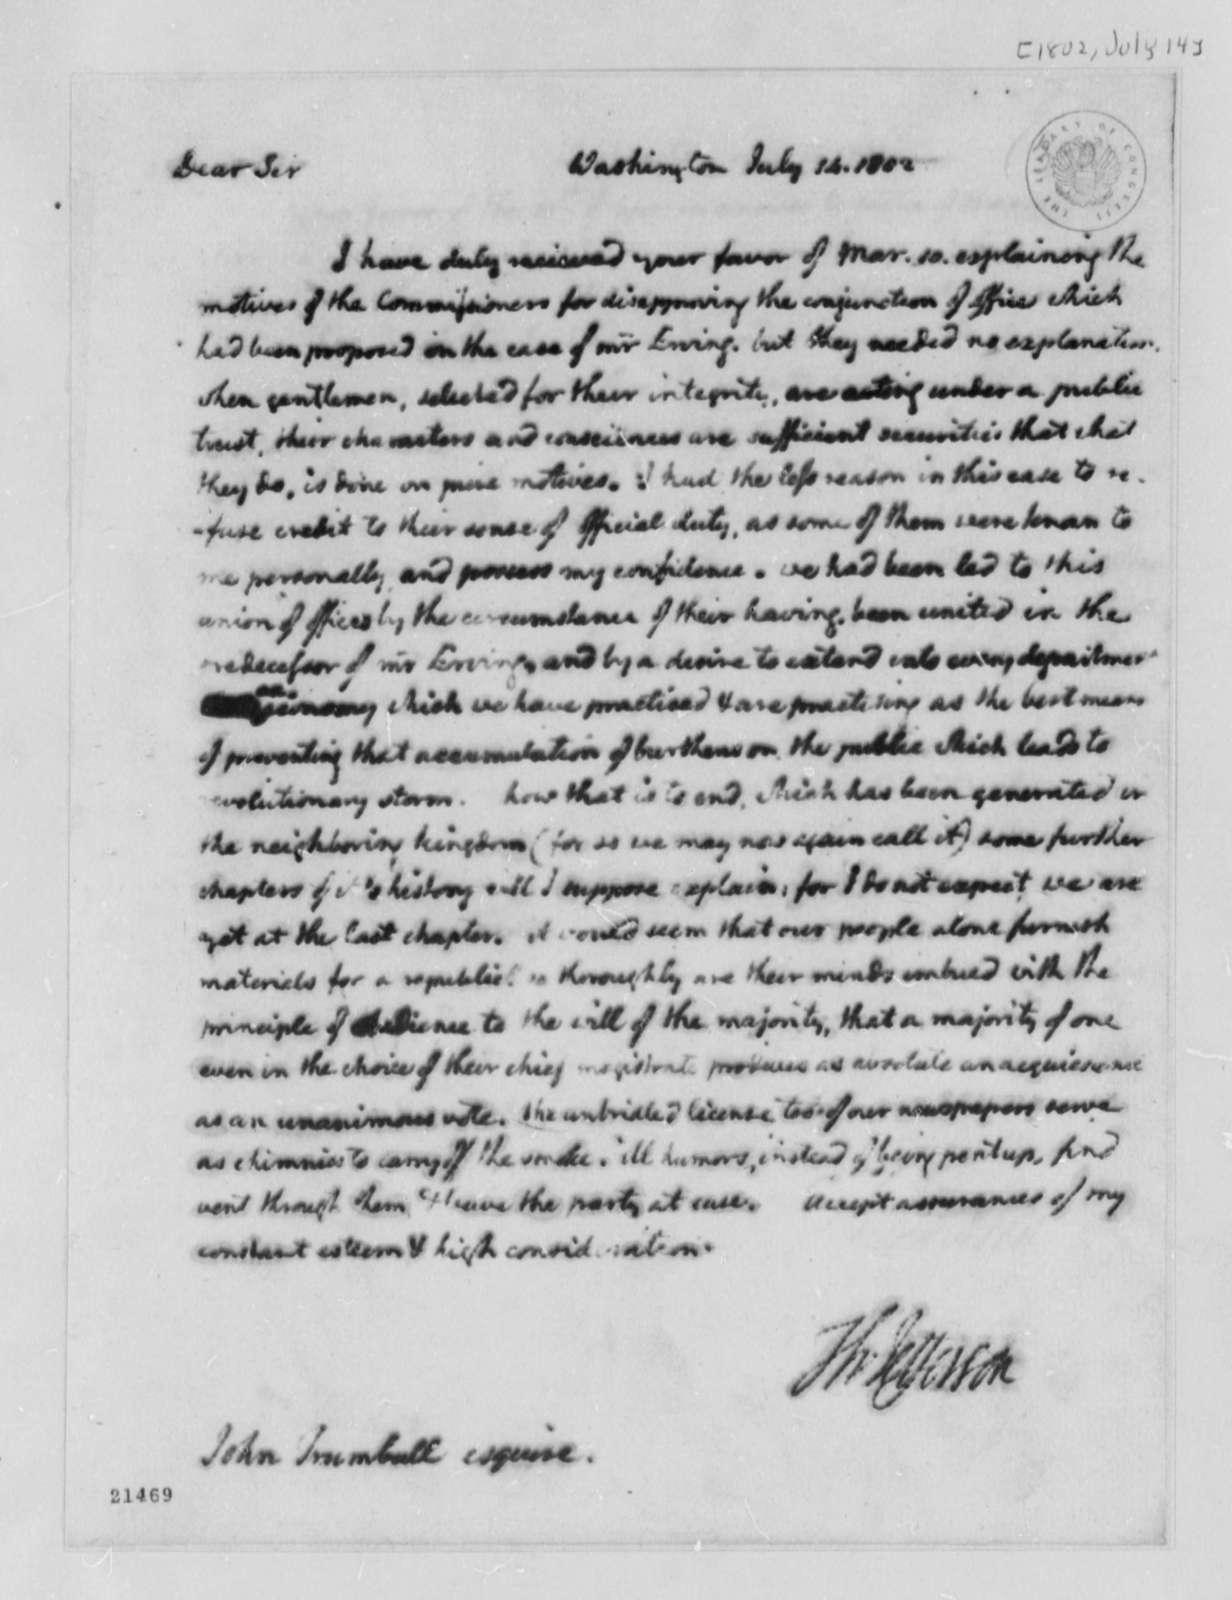 Thomas Jefferson to John Trumbull, July 14, 1802